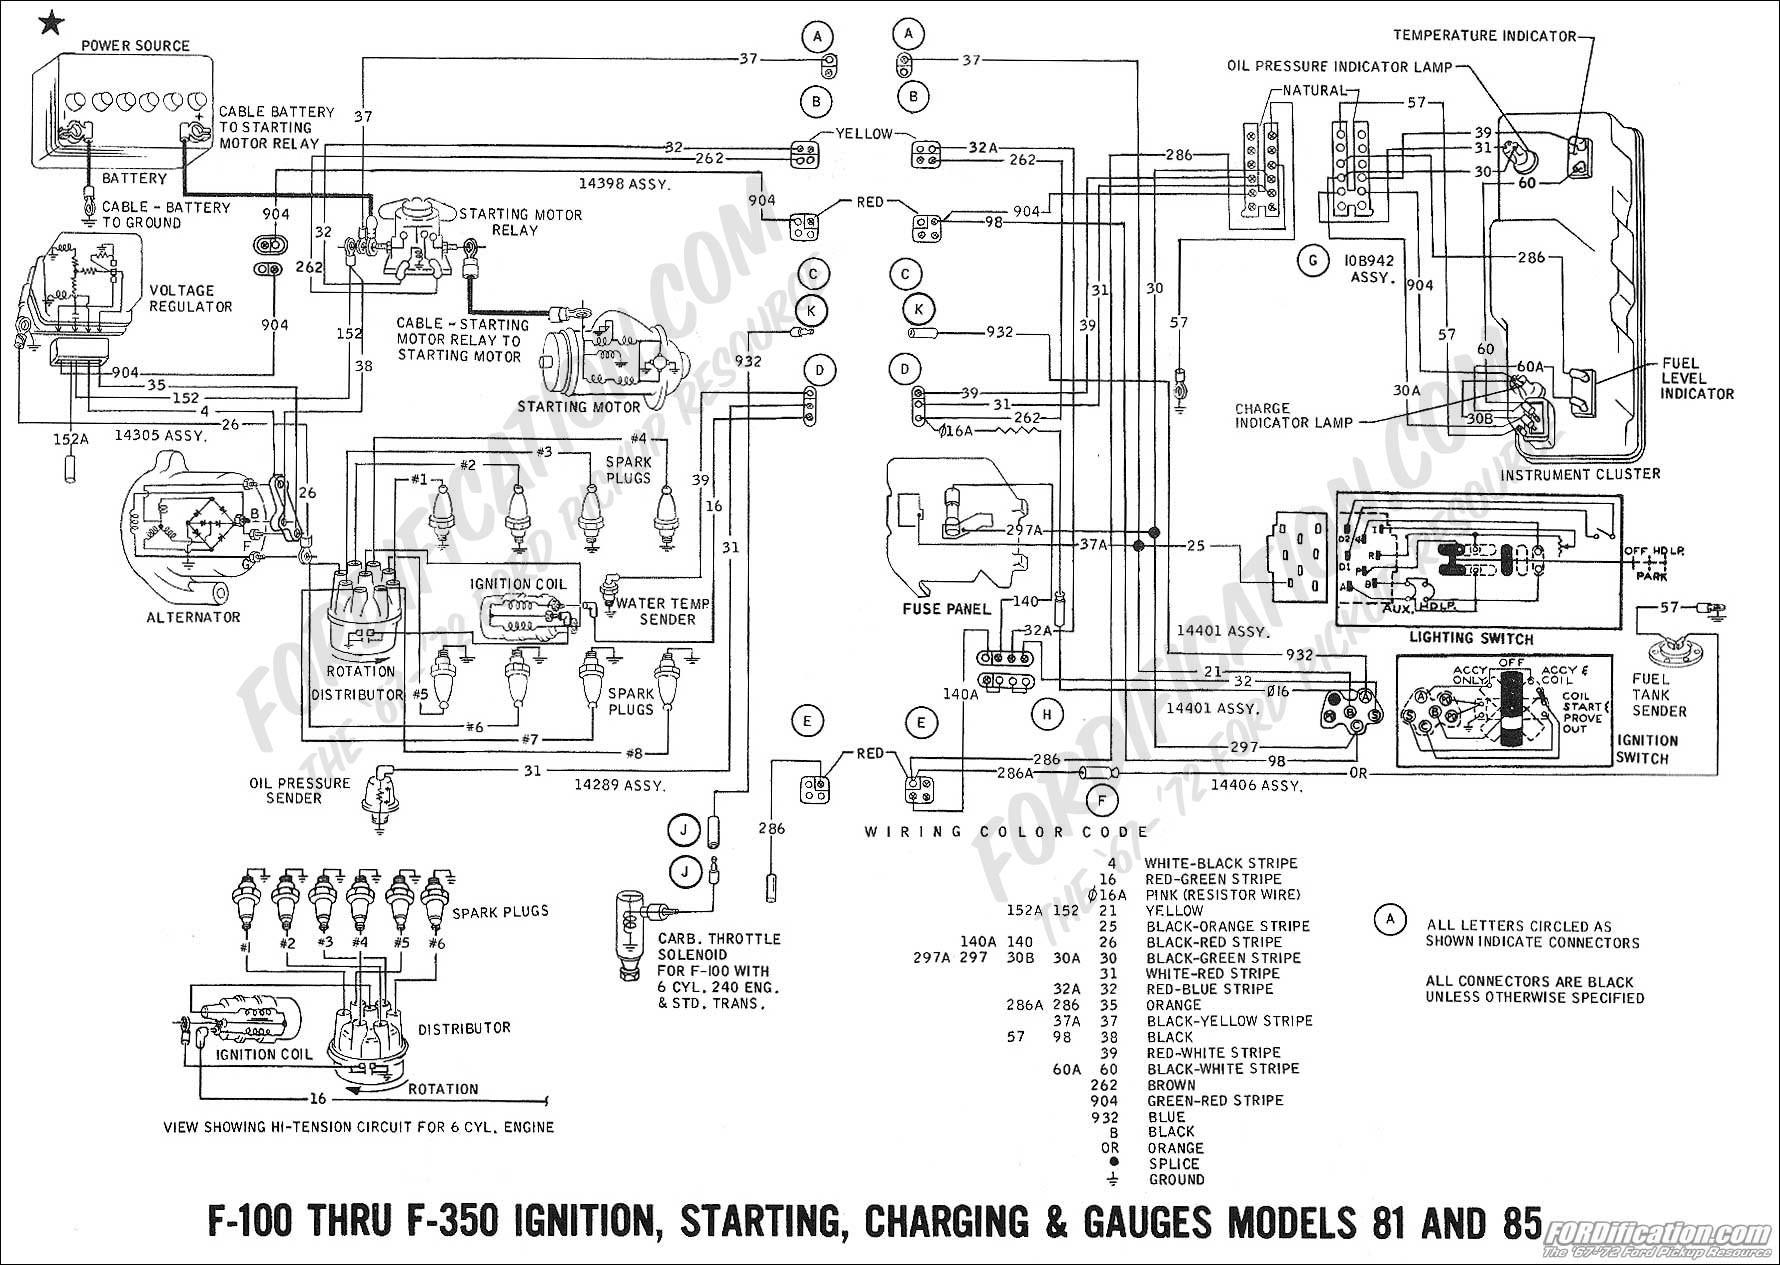 iwak kutok saturn sl1 engine diagram